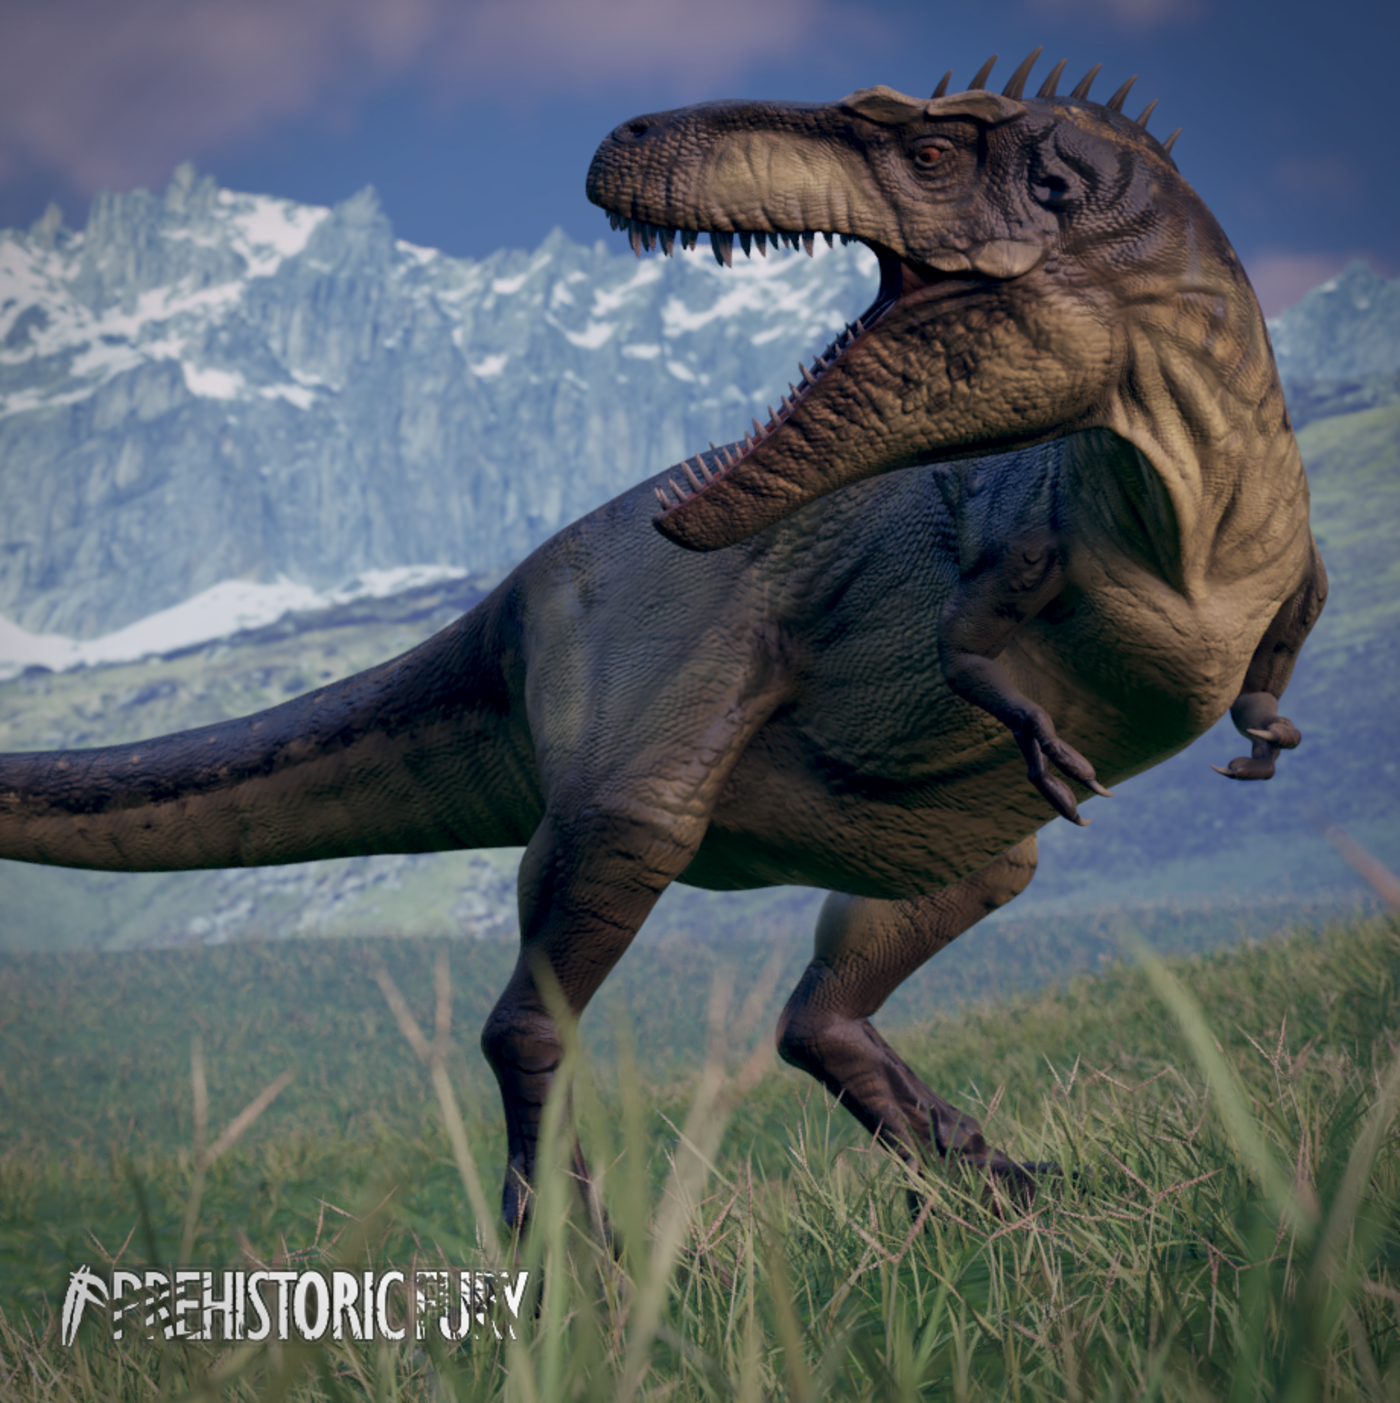 Bistahieversor - Prehistoric Fury